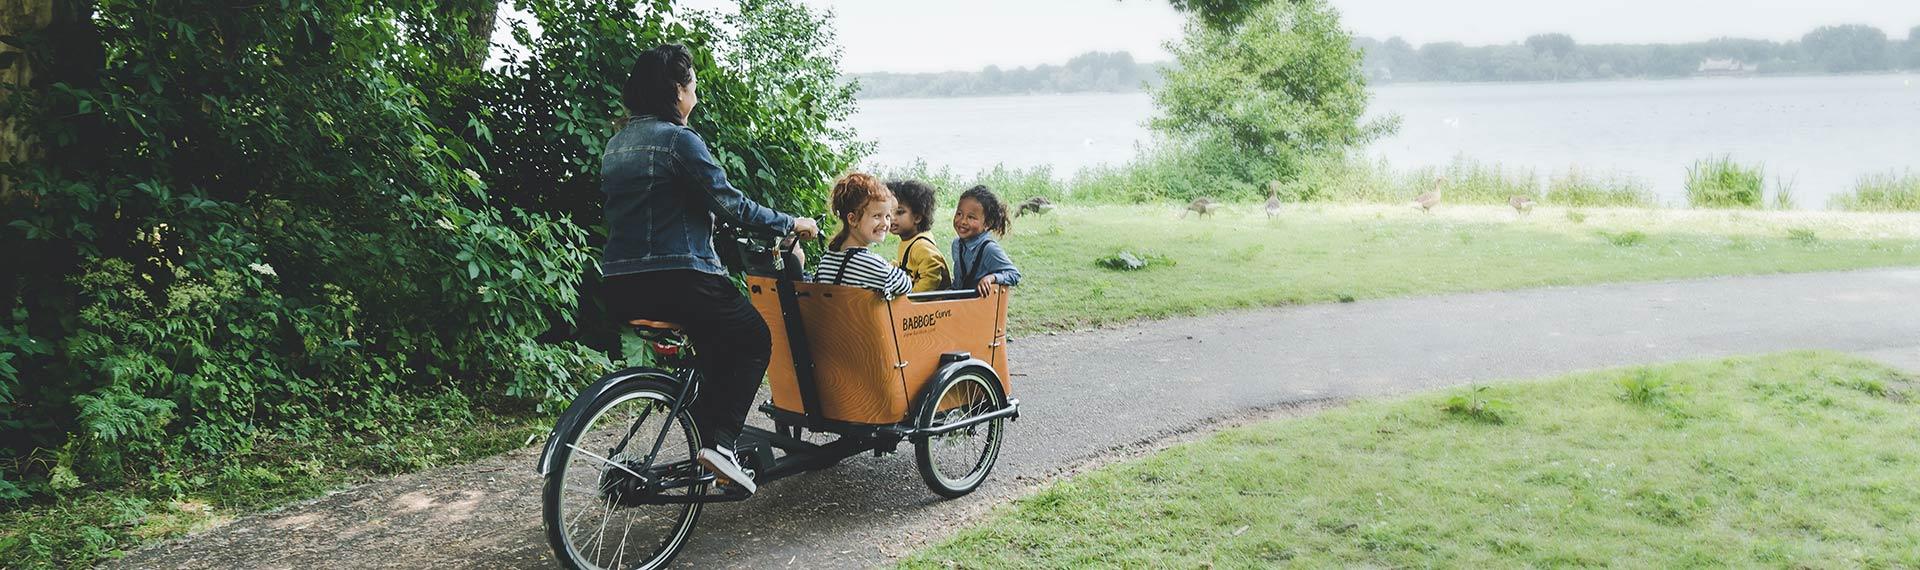 Non-electric cargo bike